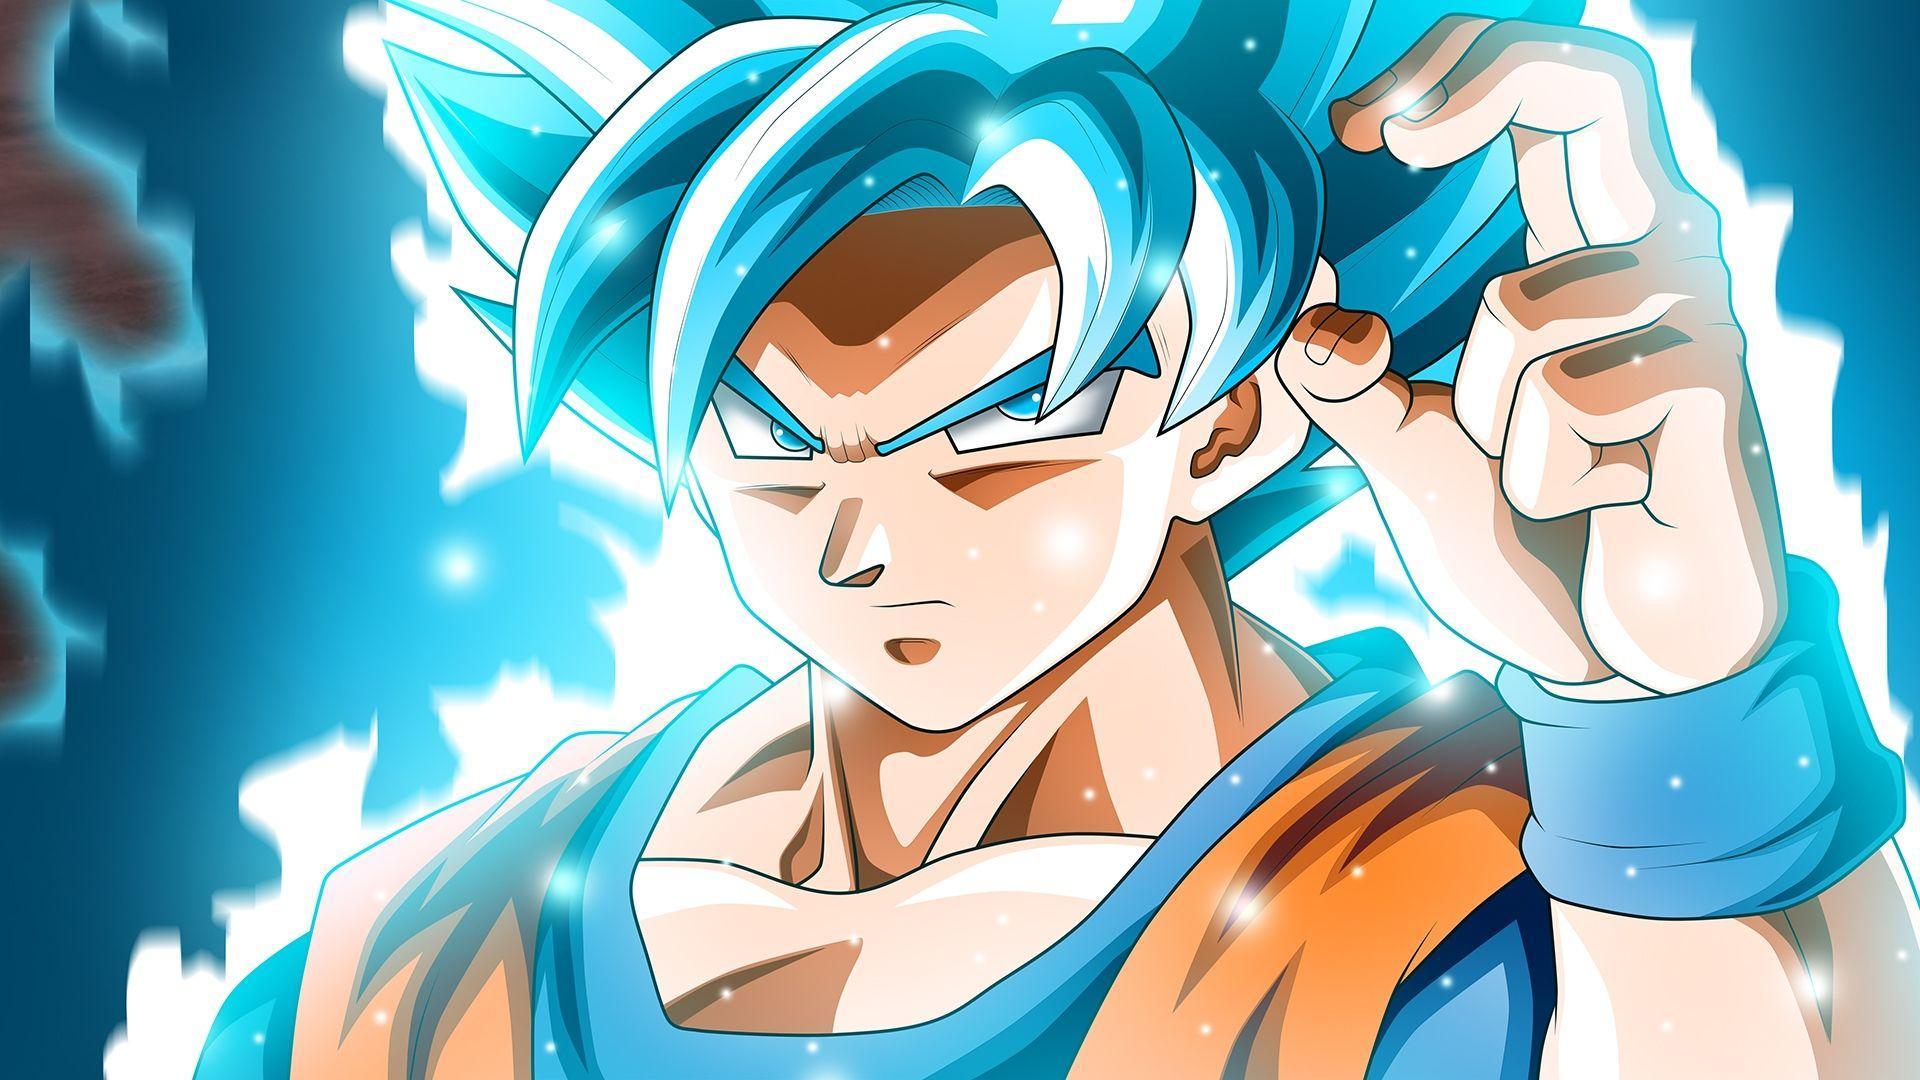 Blue Super Saiyan Goku Wallpapers - Top Free Blue Super ...